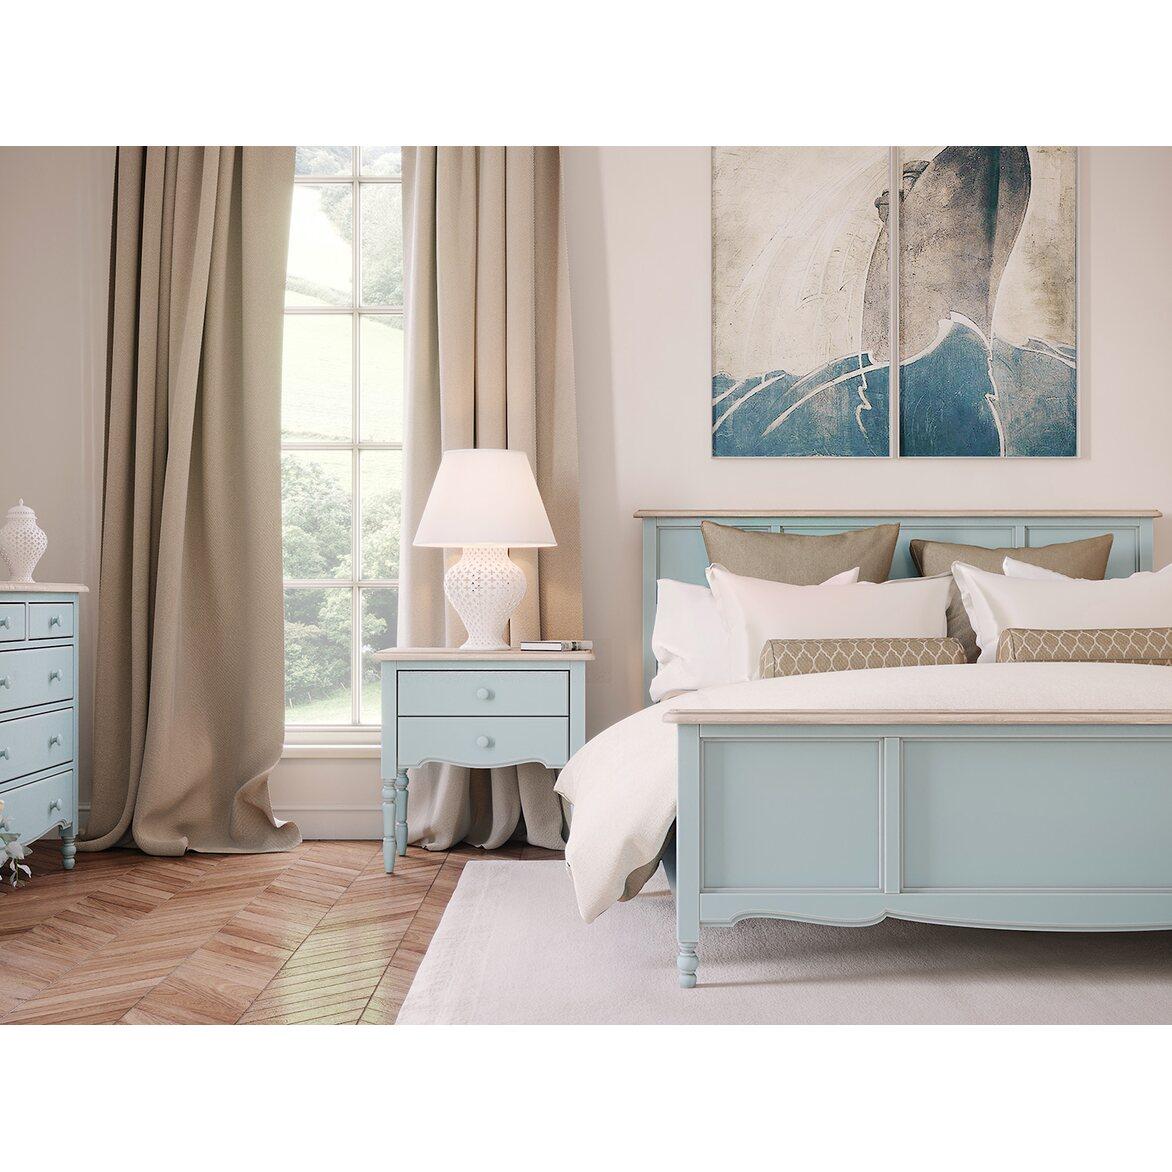 Стеллаж Leblanc, голубой 4 | Стеллажи Kingsby